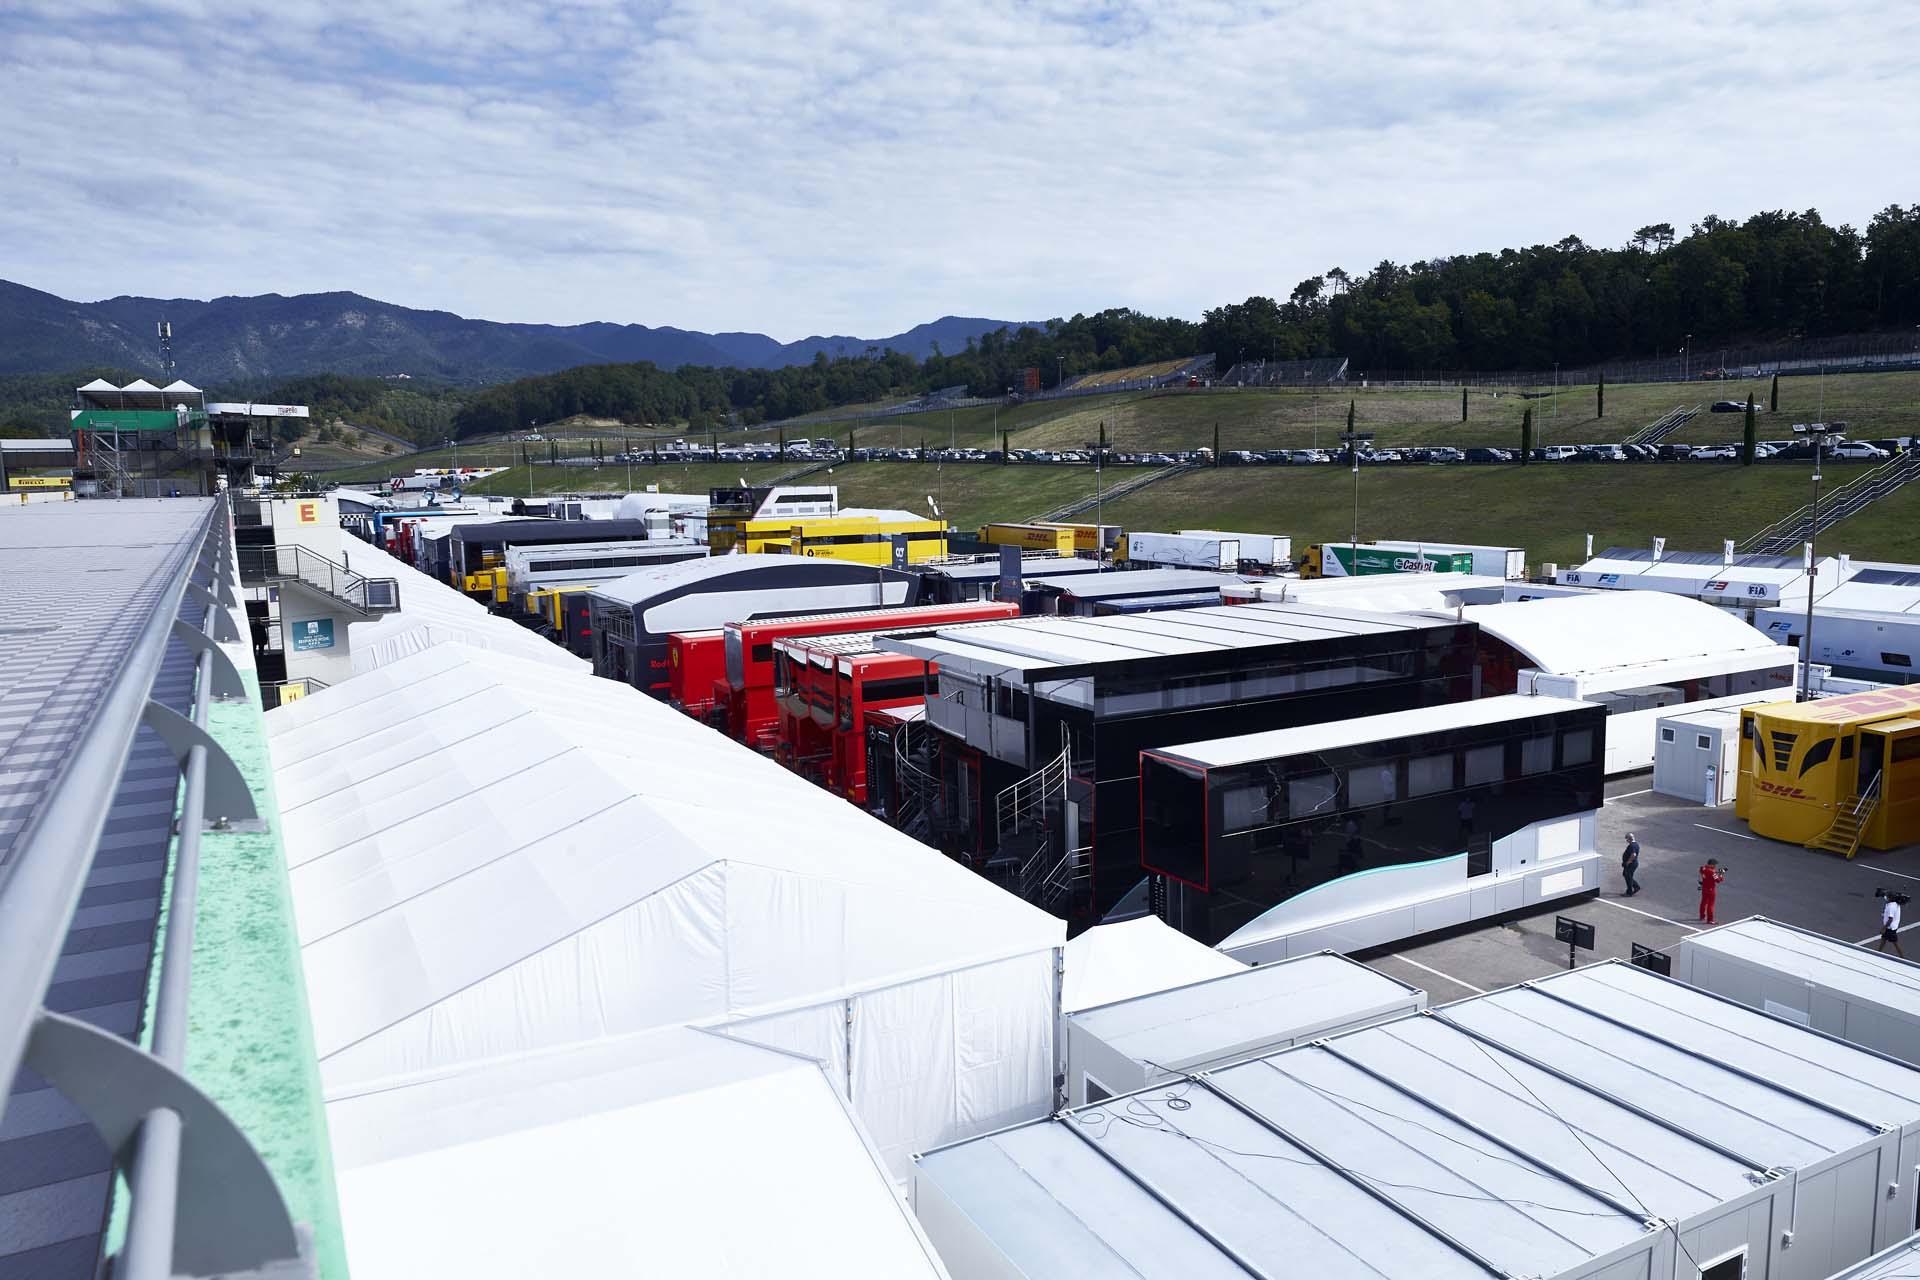 2020 Tuscan Grand Prix, Thursday - Steve Etherington